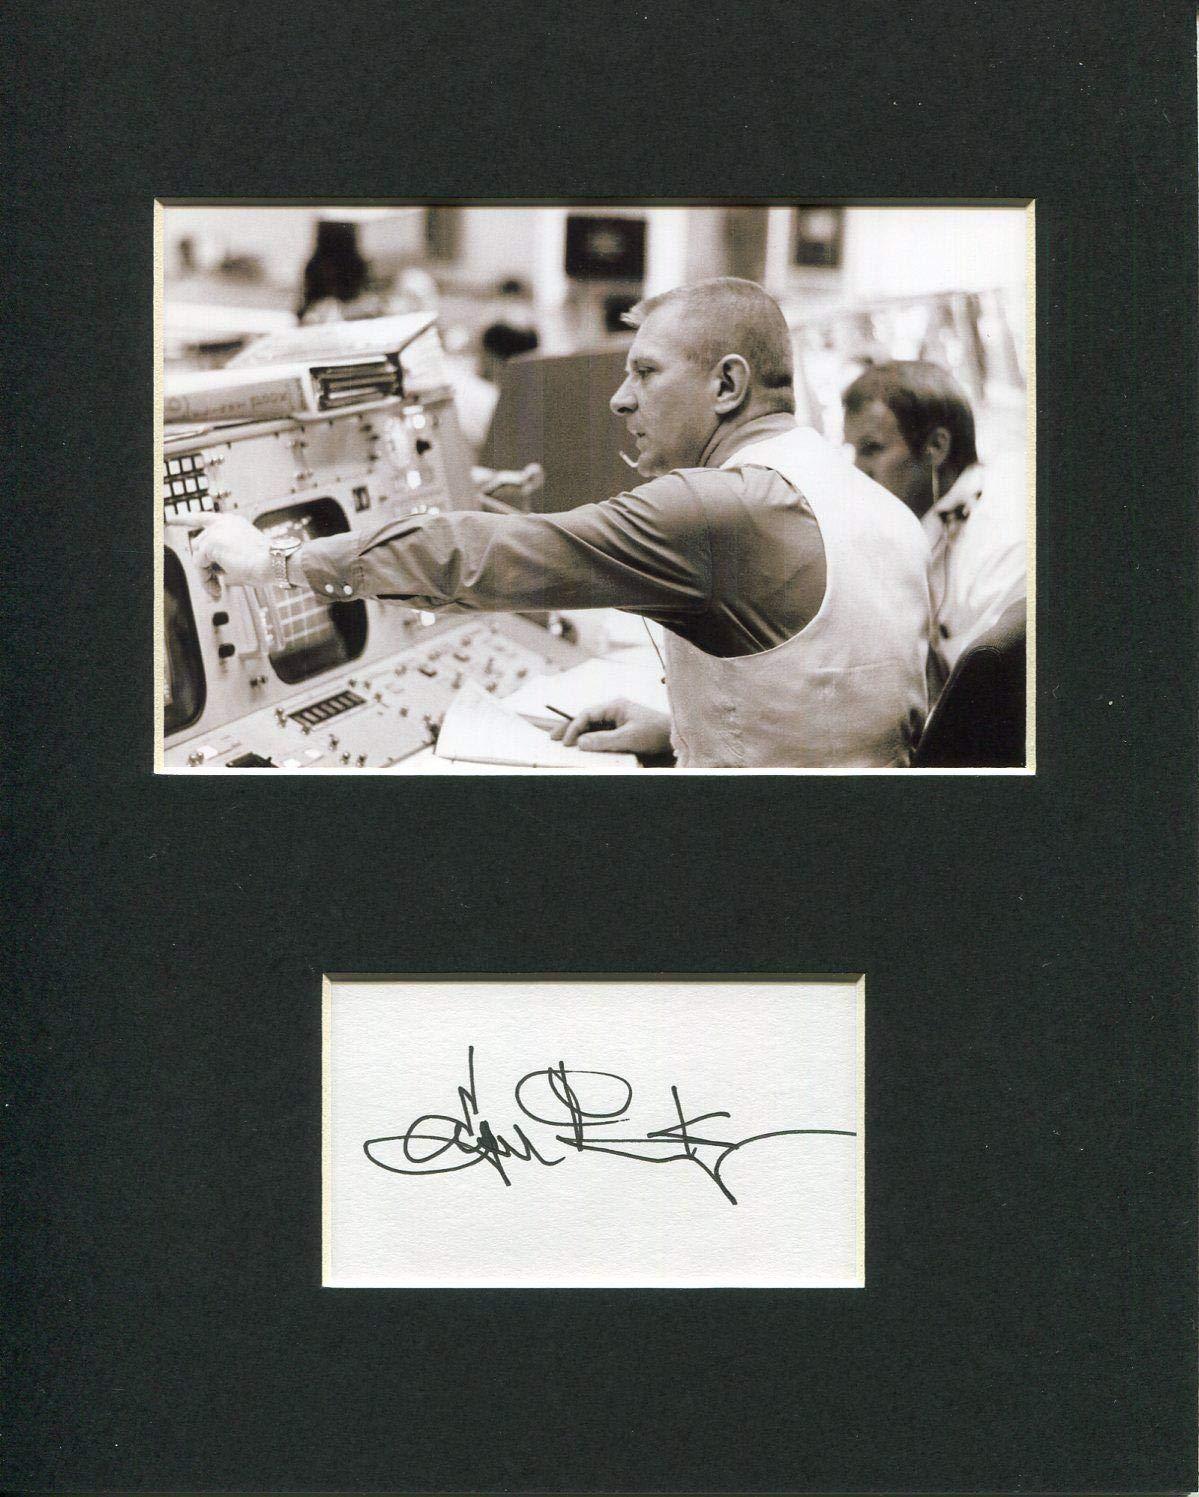 Eugene Gene Kranz NASA Flight Director Space Signed Autograph Rare Photo Display HollywoodMemorabilia